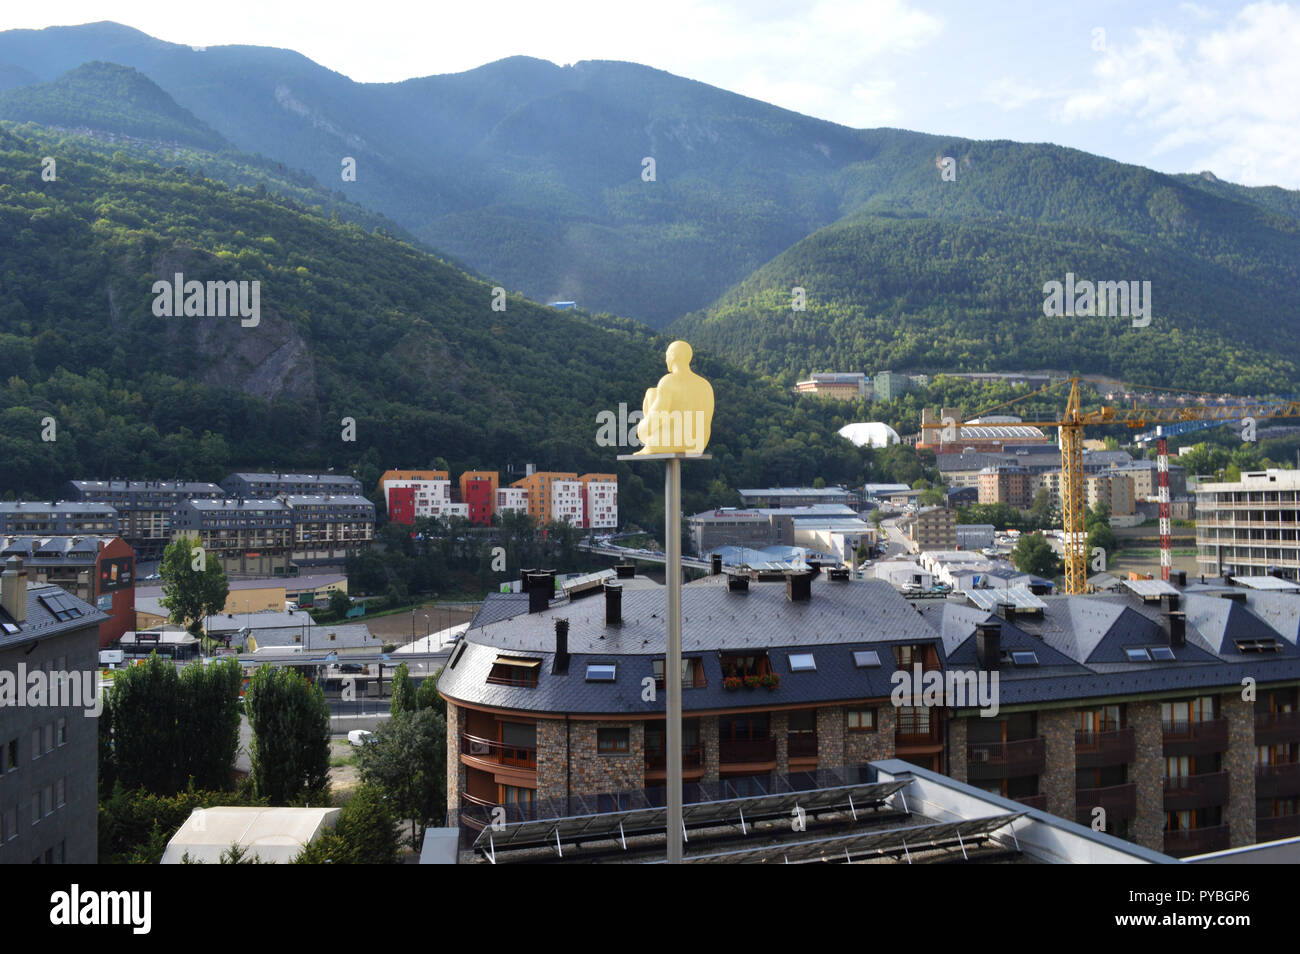 Andorra La Vella, Andorra. 18th Sep, 2018. Andorra la Vella, capital of Andorra, located in the Pyrenees, recorded on 18.09.2018 | usage worldwide Credit: dpa/Alamy Live News Stock Photo